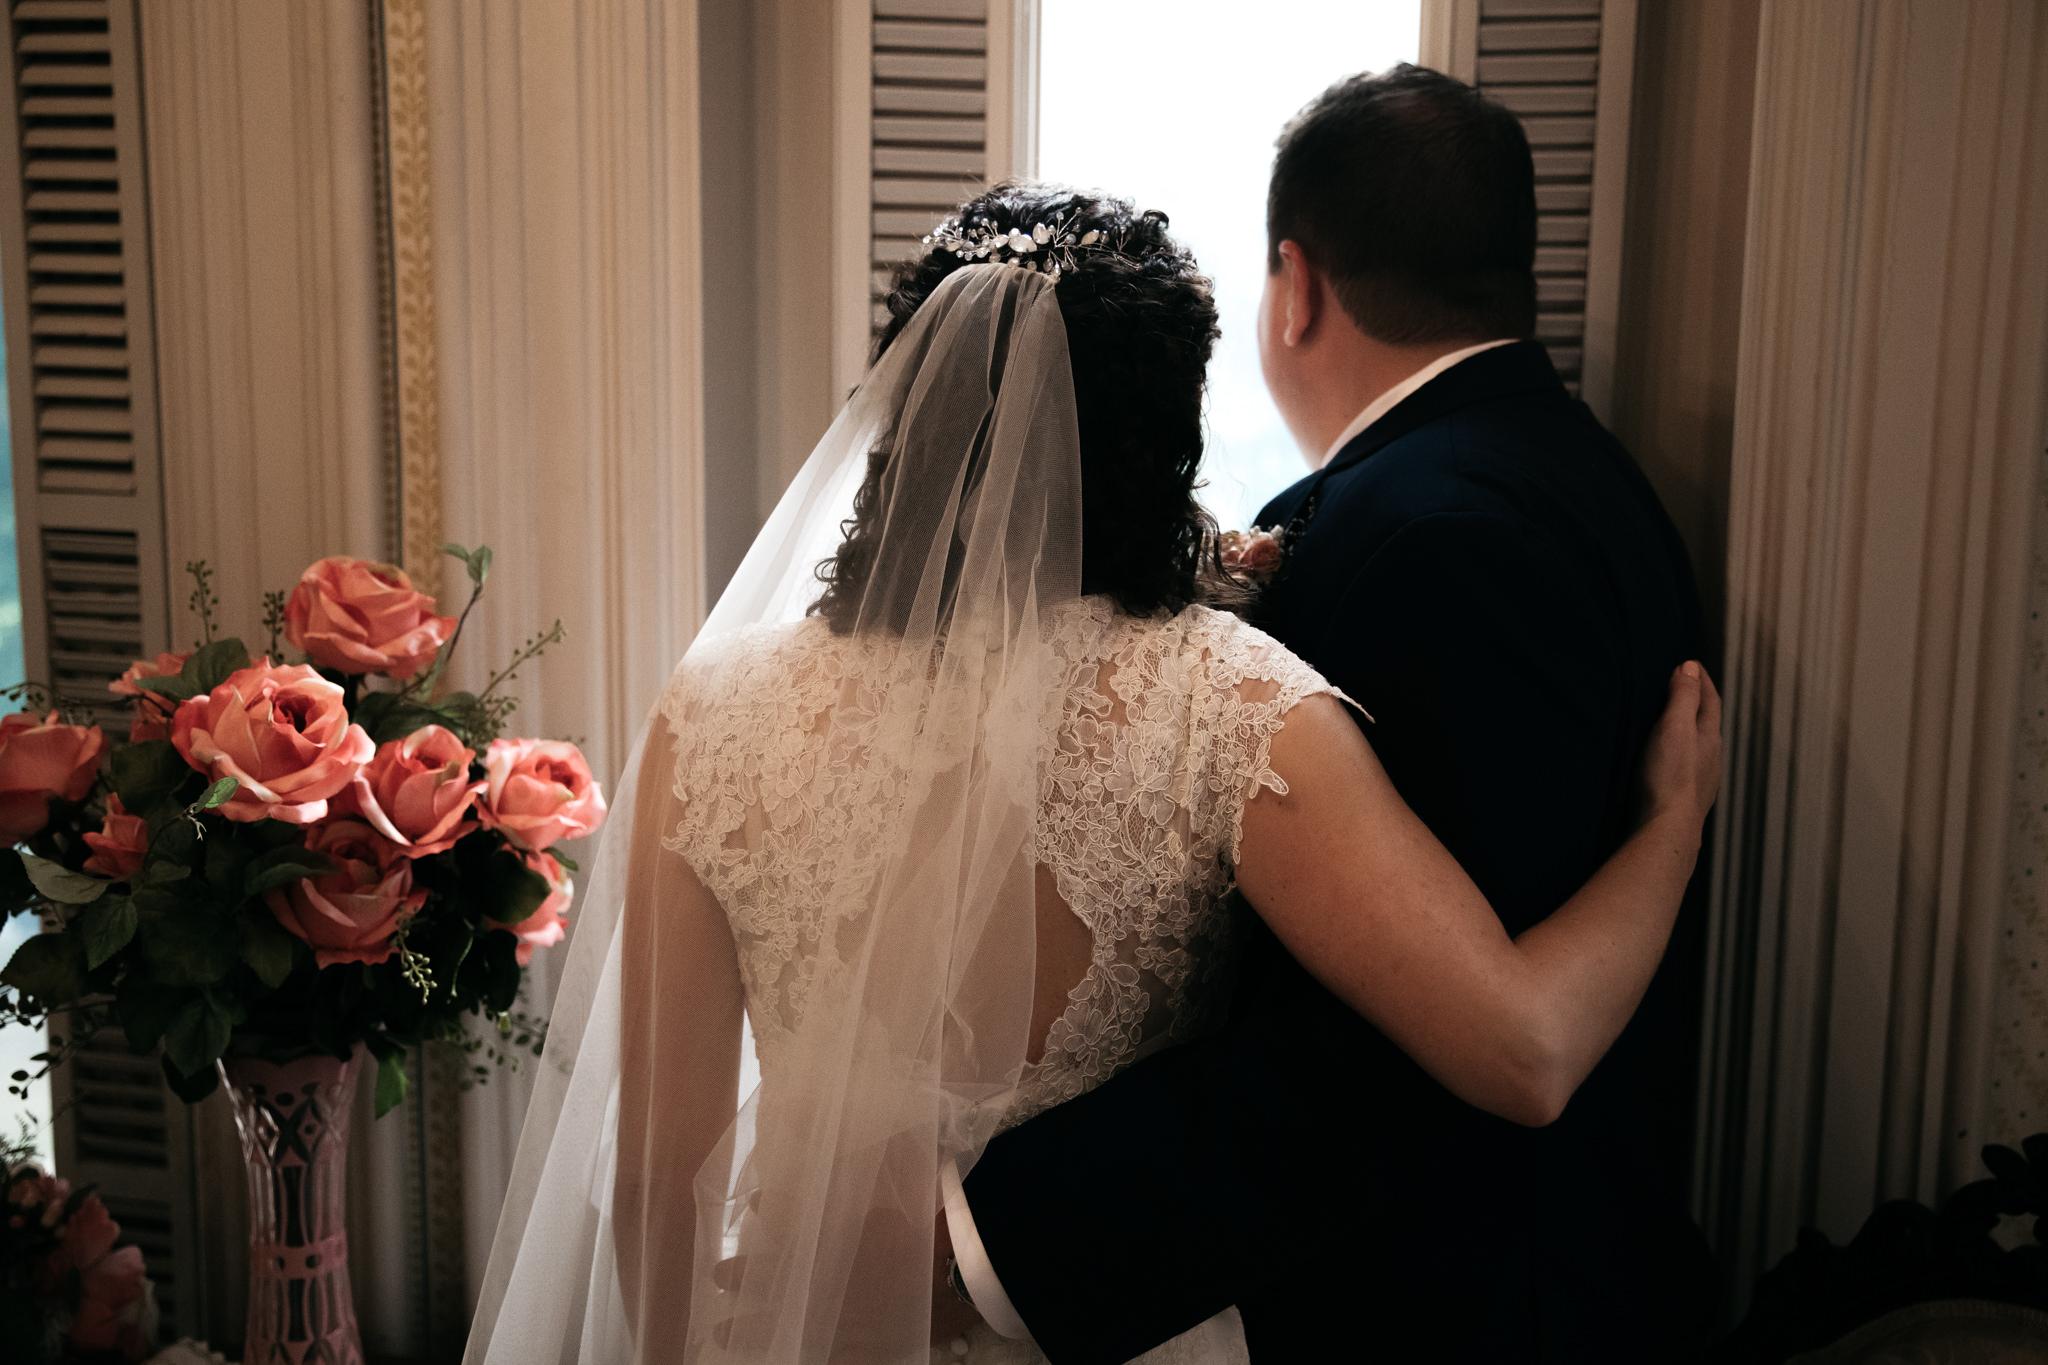 woodruff-fontaine-wedding-venue-memphis-thewarmtharoundyou-brenda-taylor-3-2.jpg